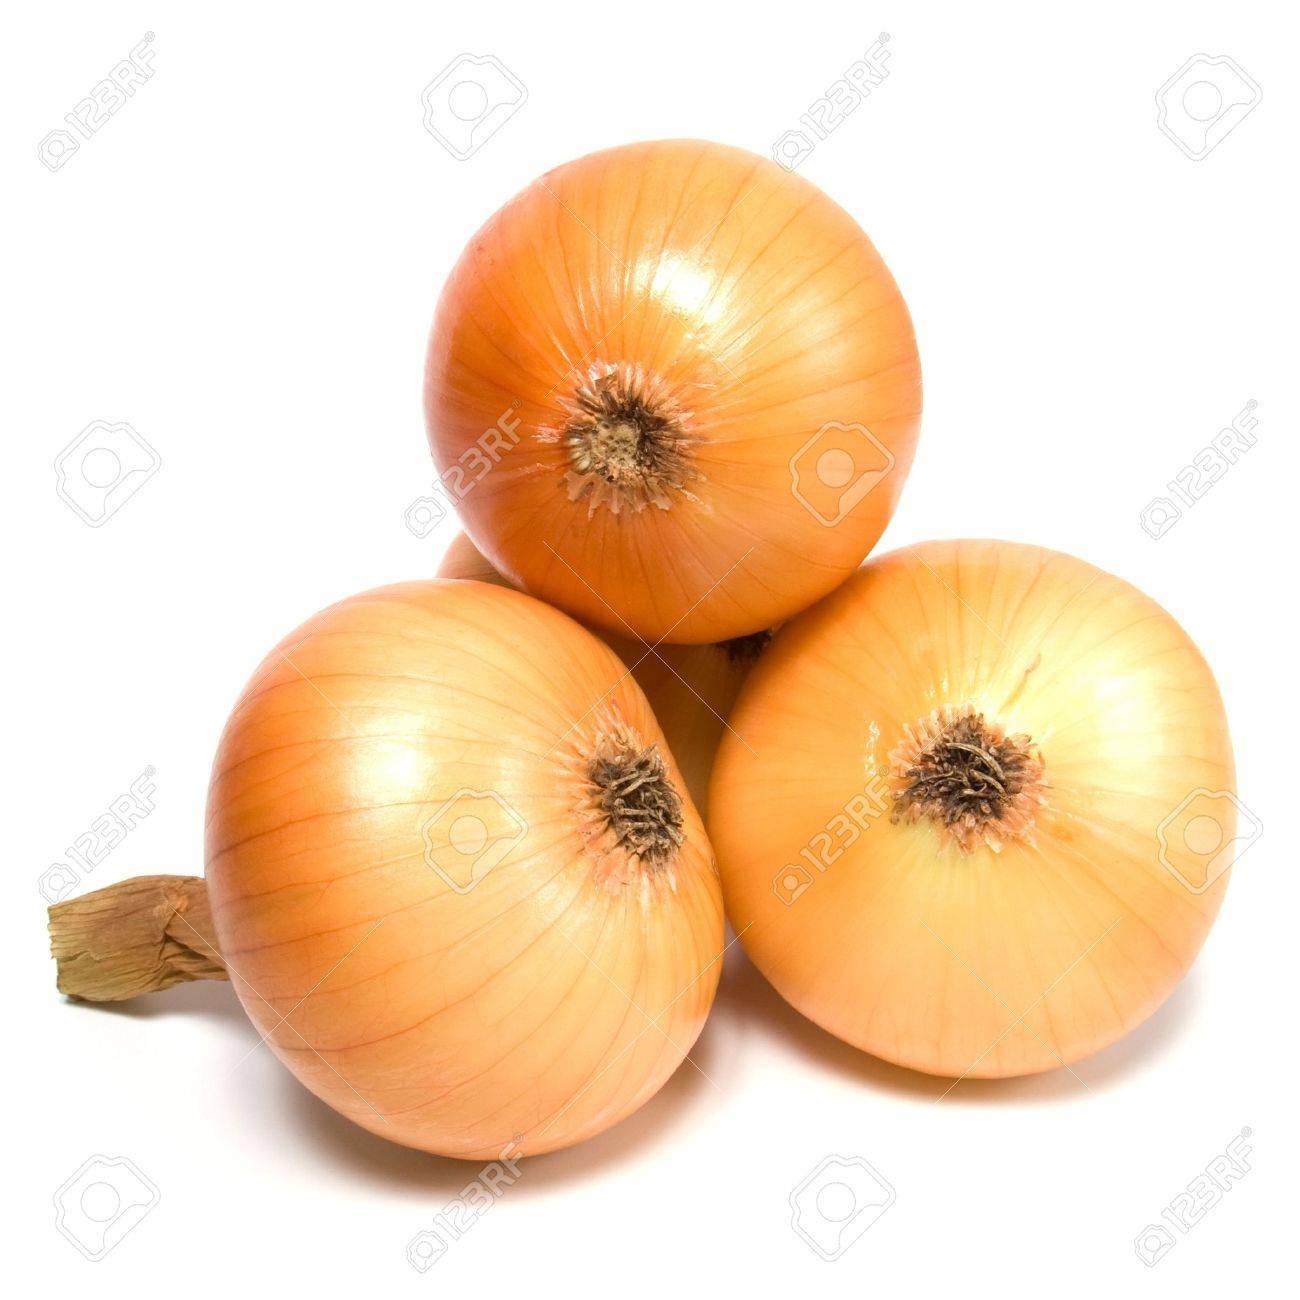 onion isolated on white background Stock Photo - 5982588